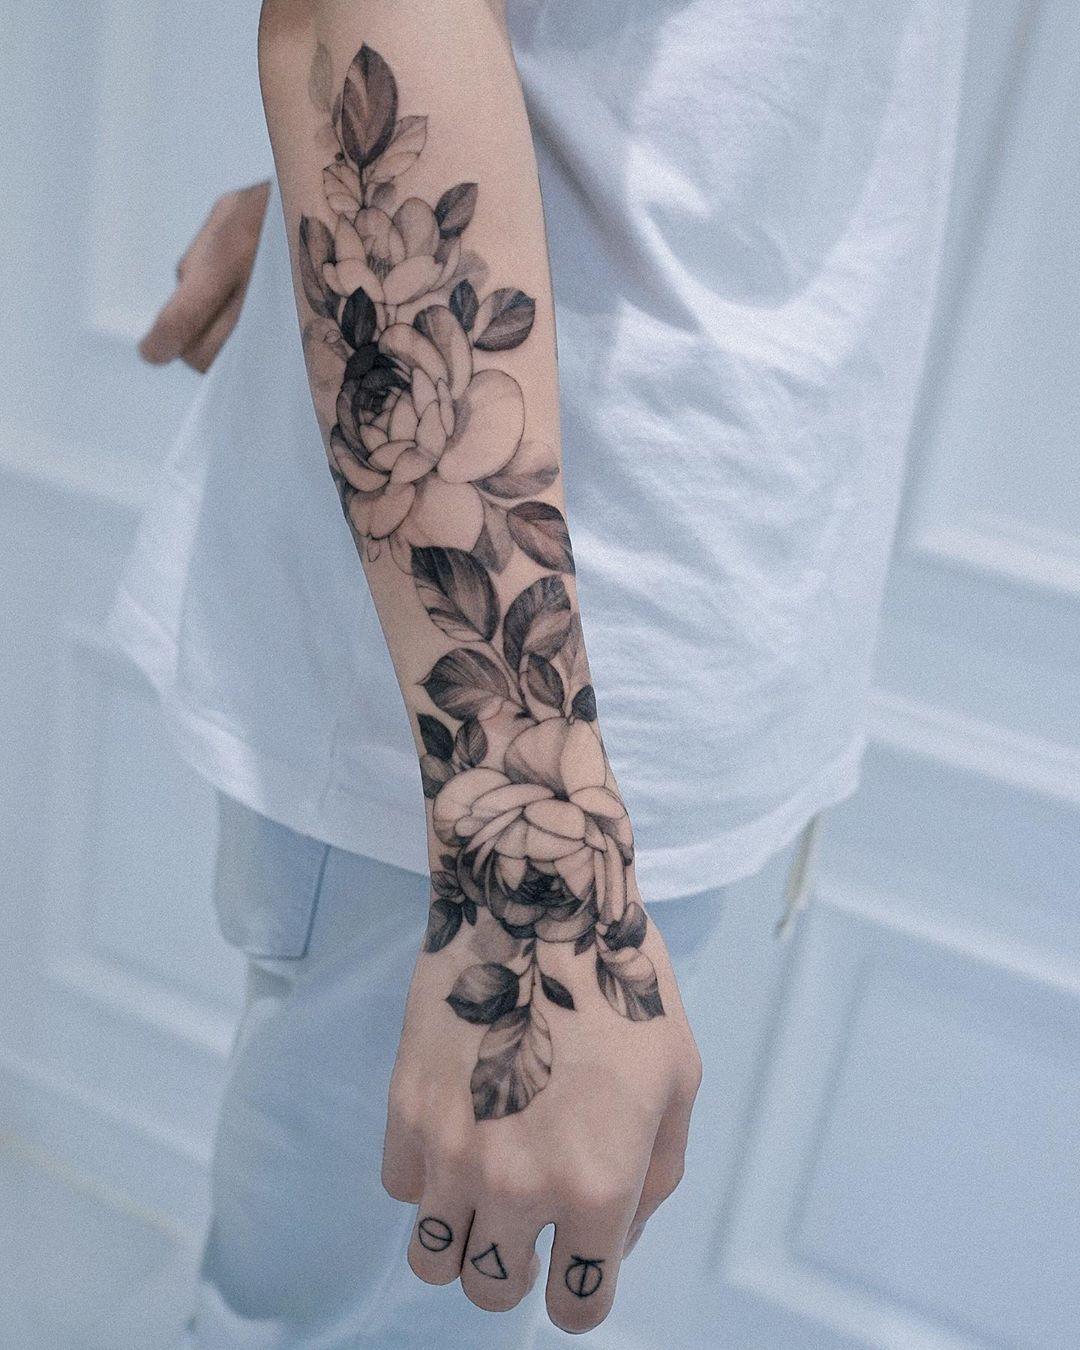 4months Healed Done At Lejardindezihwa Artist Zihwa Tattooer Cool Tattoos Arm Band Tattoo For Women Flower Wrist Tattoos